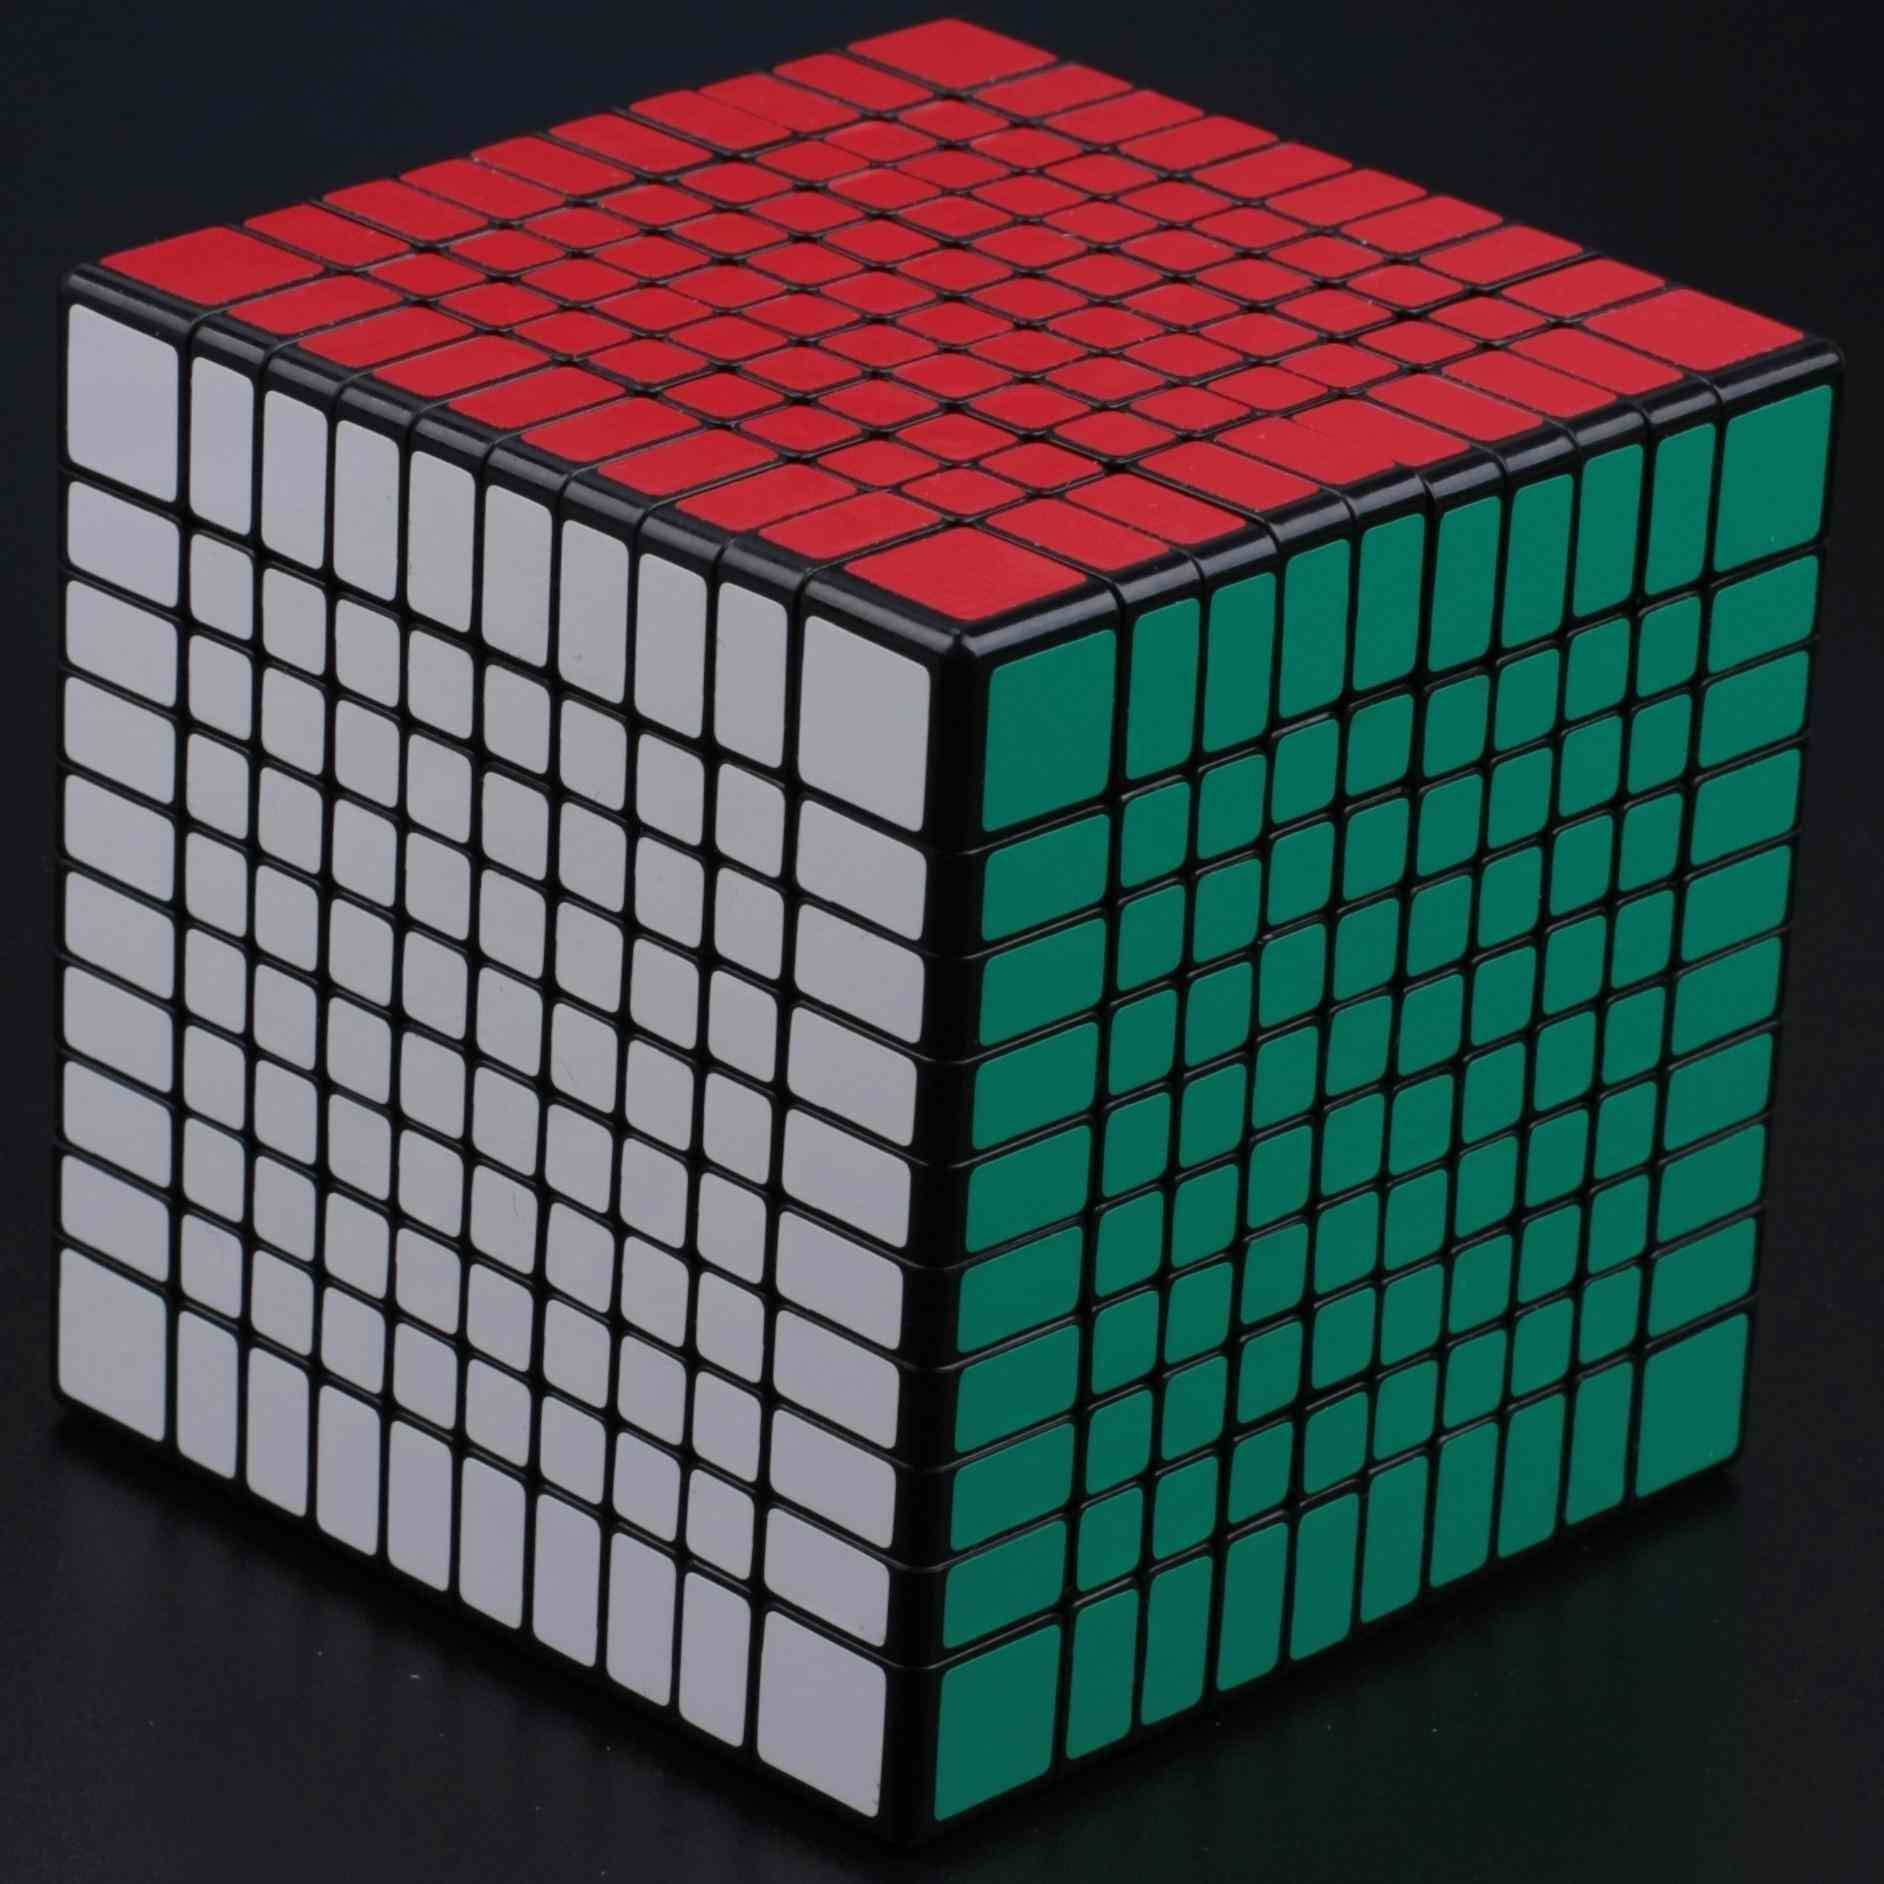 FO 聖手 十階 黑色魔術方塊 10階 速解 SS魔方 無備用貼 高階